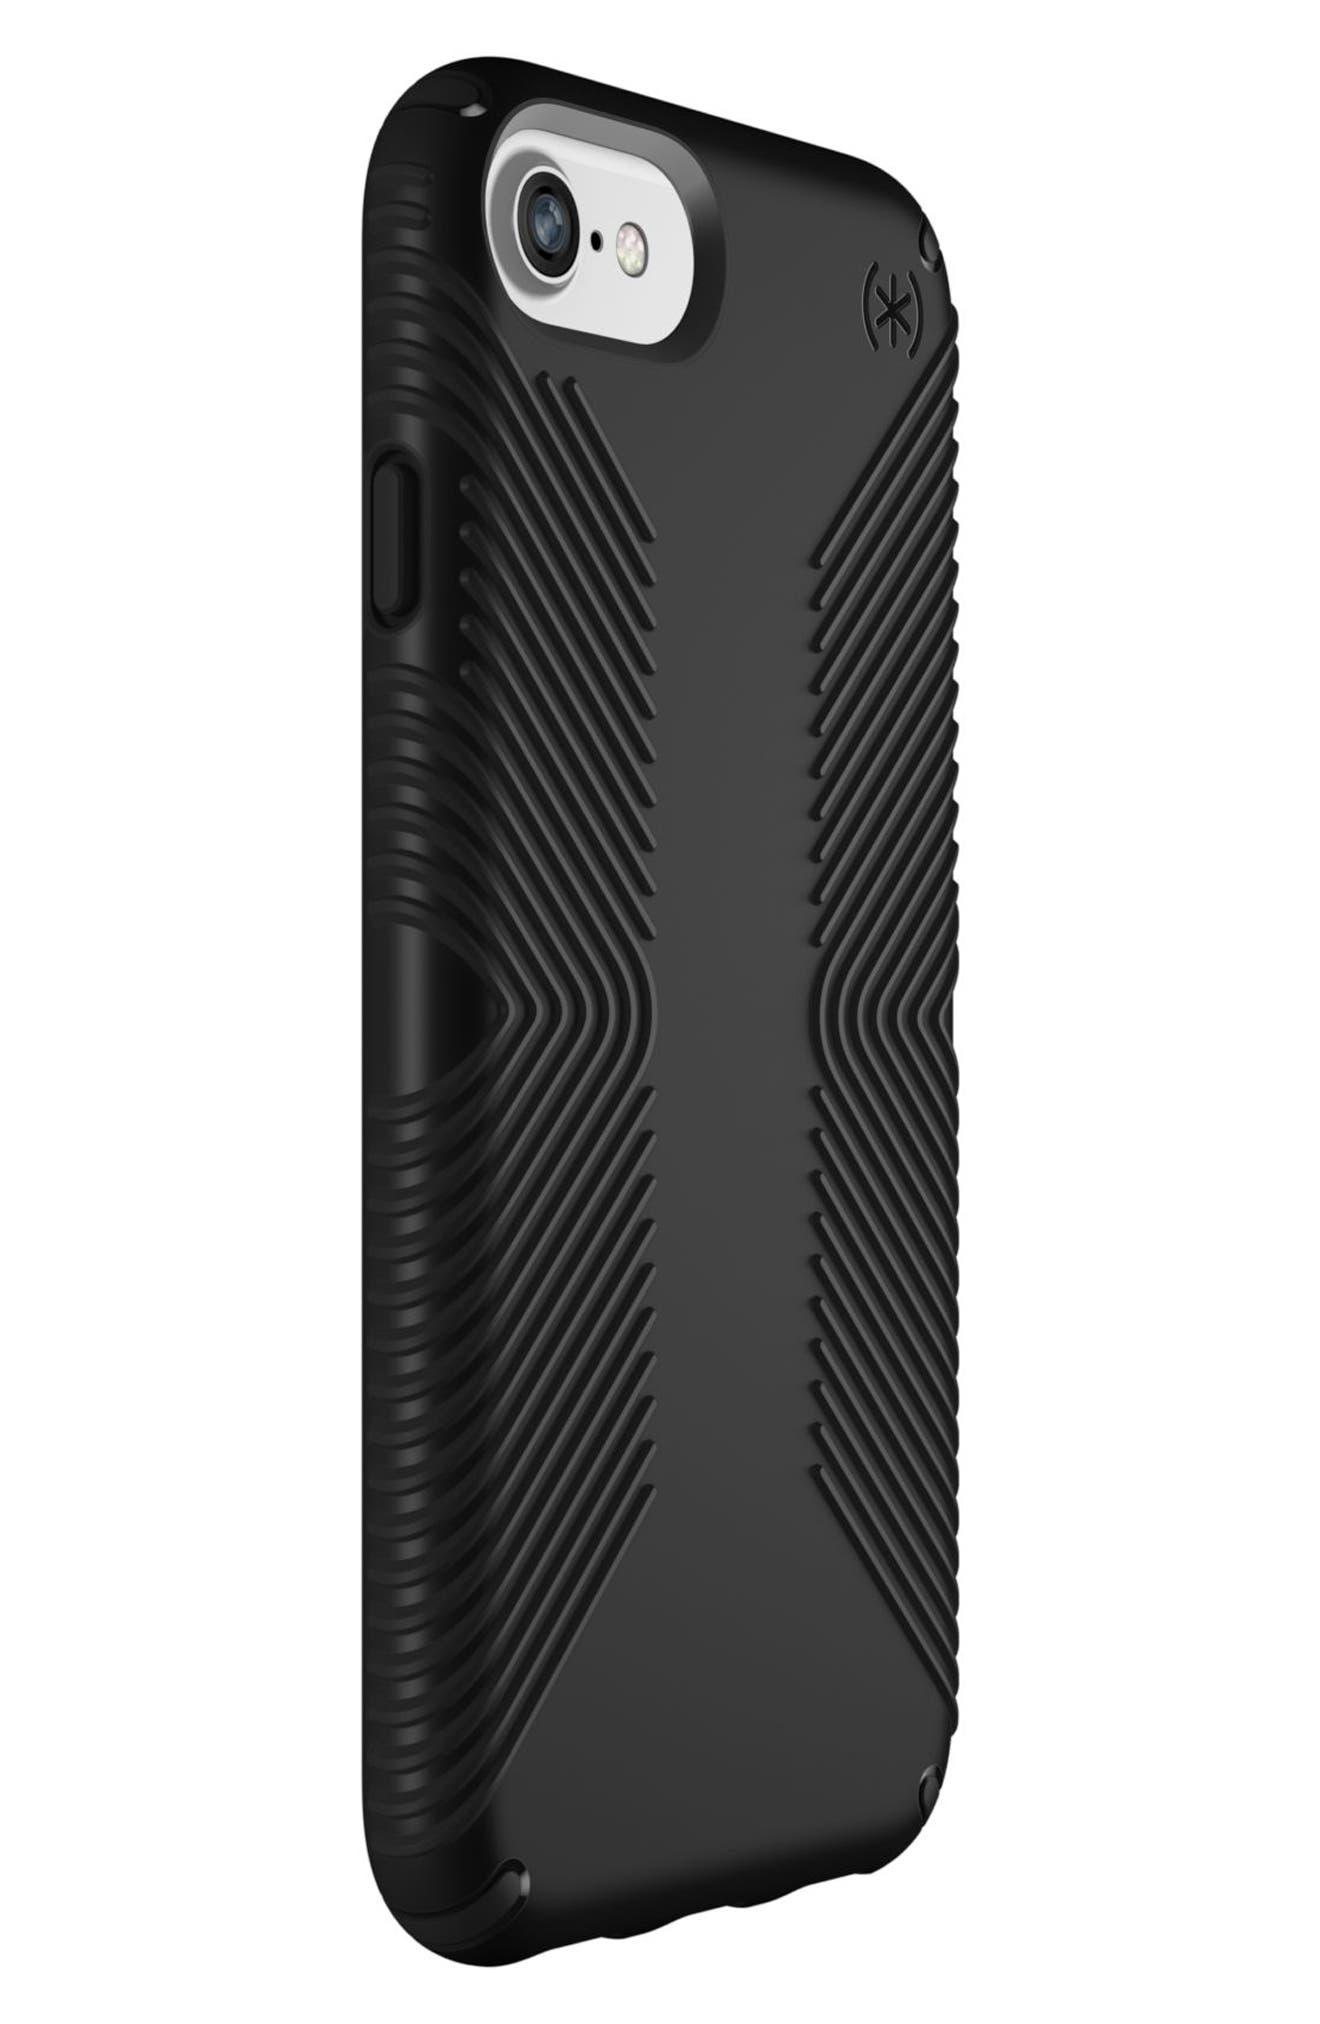 Grip iPhone 6/6s/7/8 Case,                             Alternate thumbnail 8, color,                             001